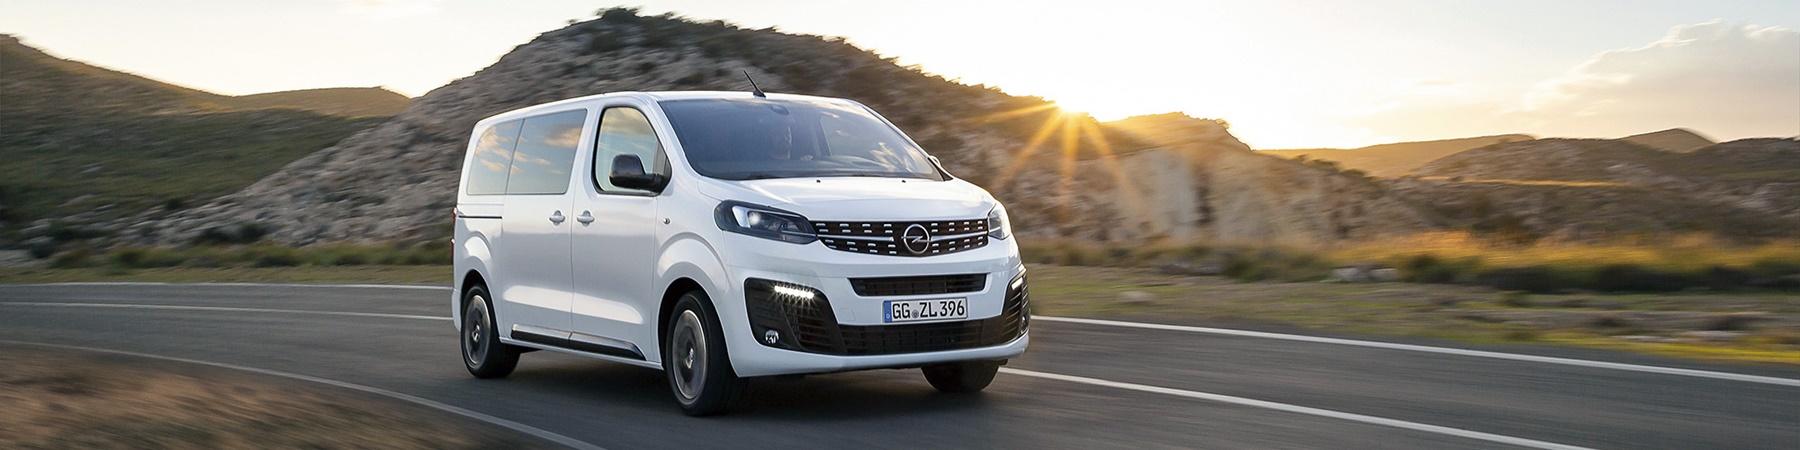 Opel Zafira Life 50kWh 196 km actieradius